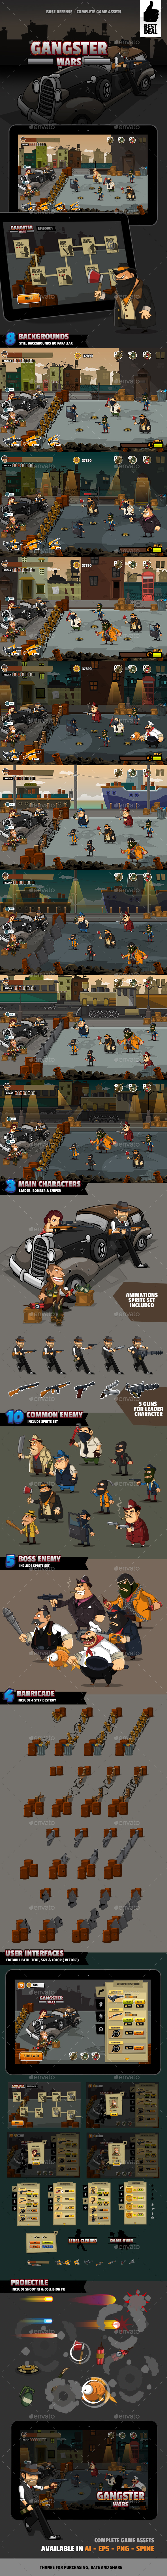 Gangster Wars - Game Kits Game Assets